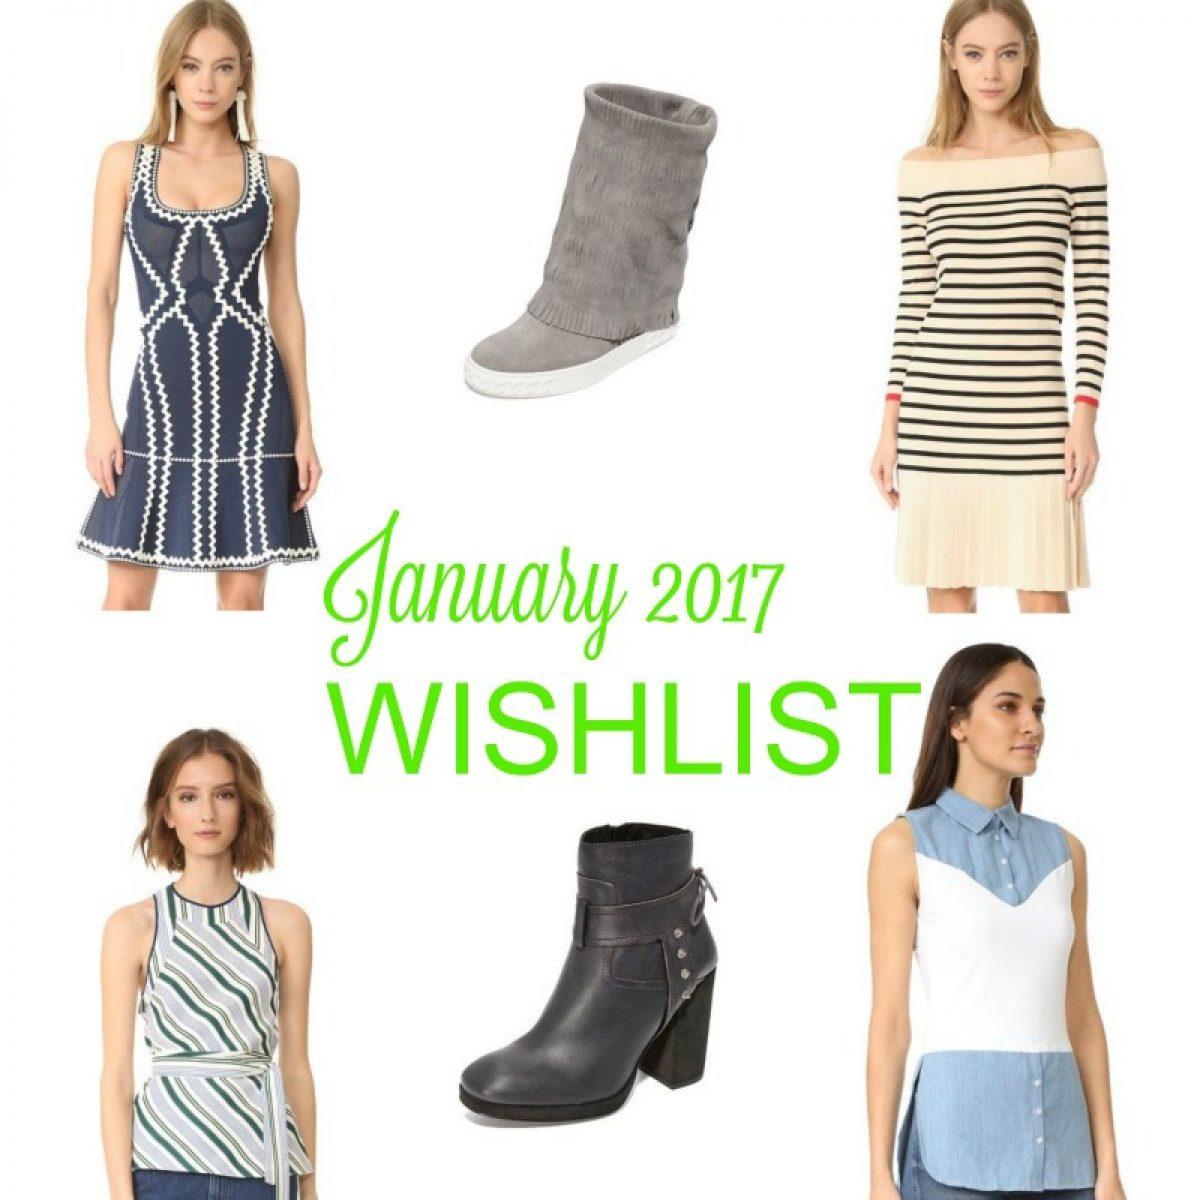 January 2017 wishlist